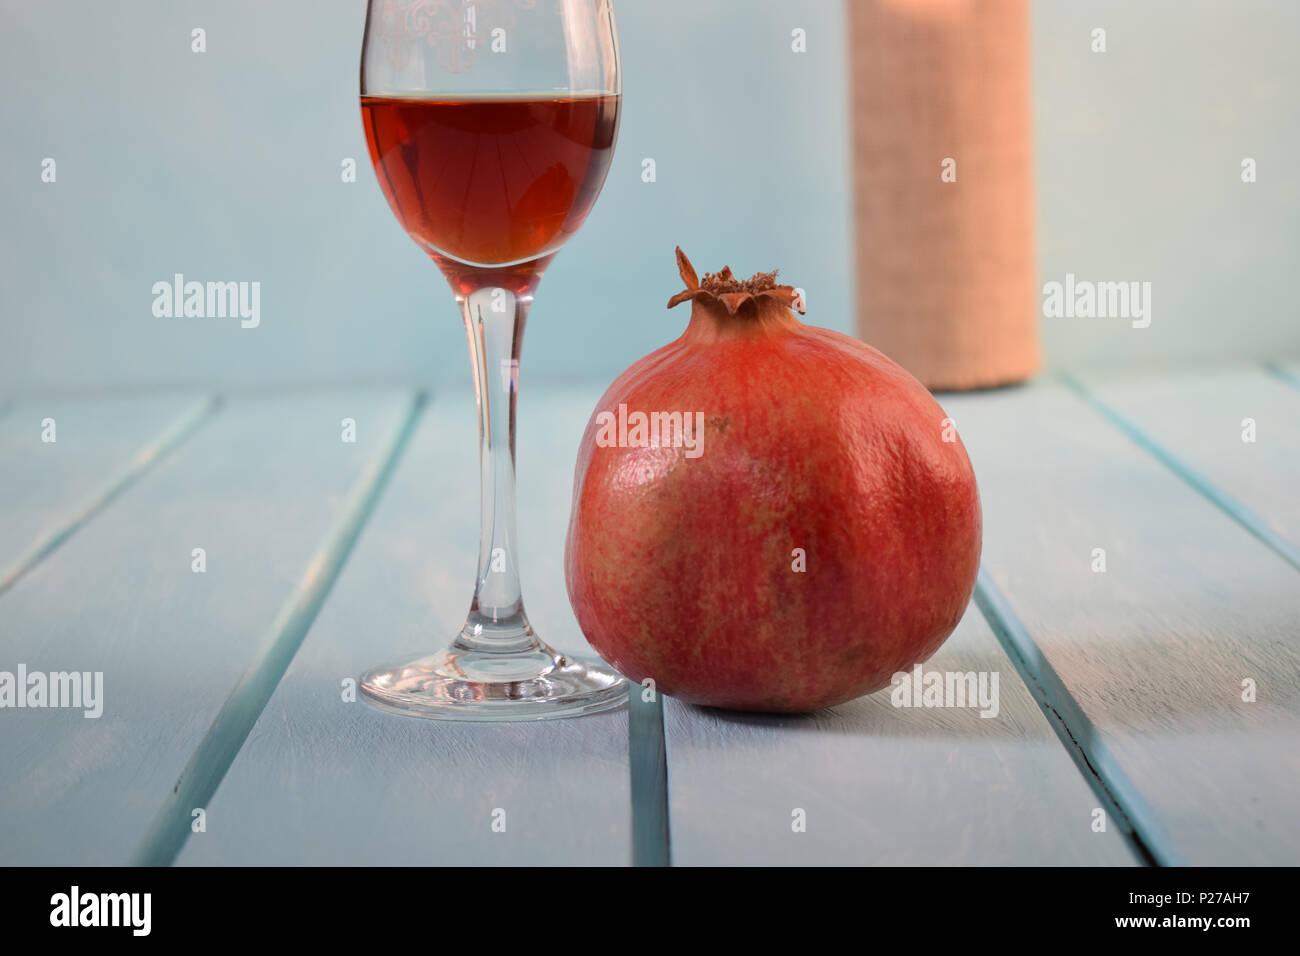 garnet and wineglass - Stock Image